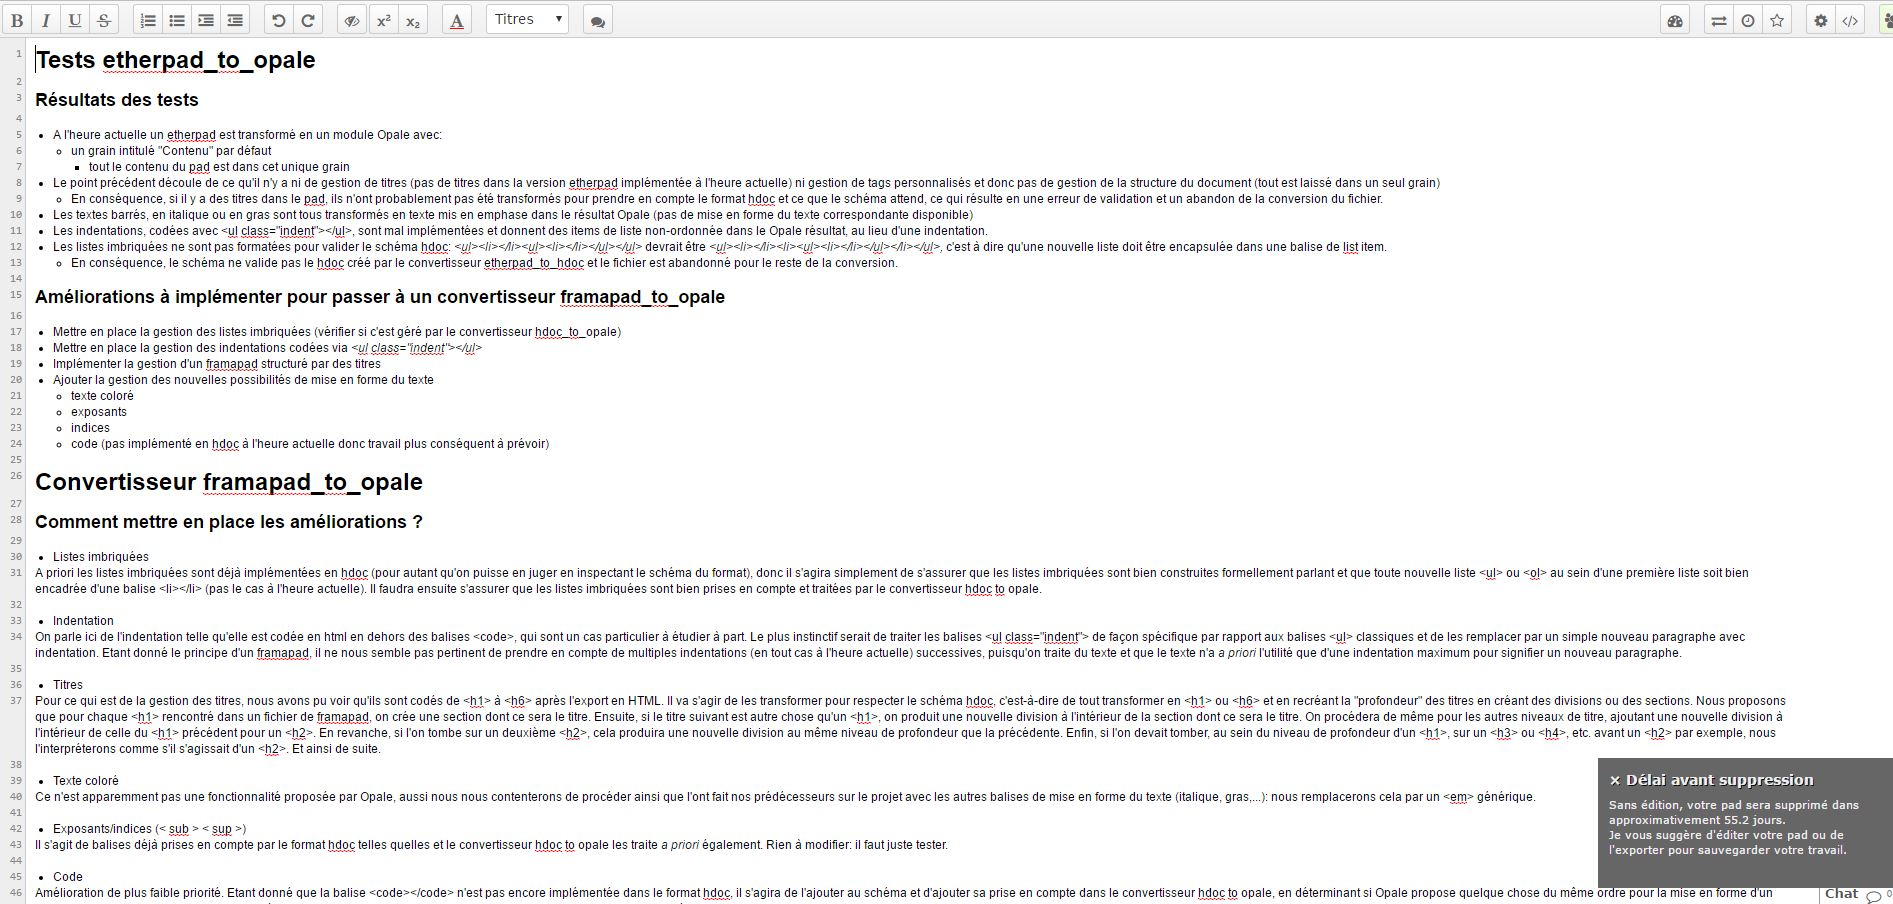 framapad_to_opale/sample/exampleframapad.JPG